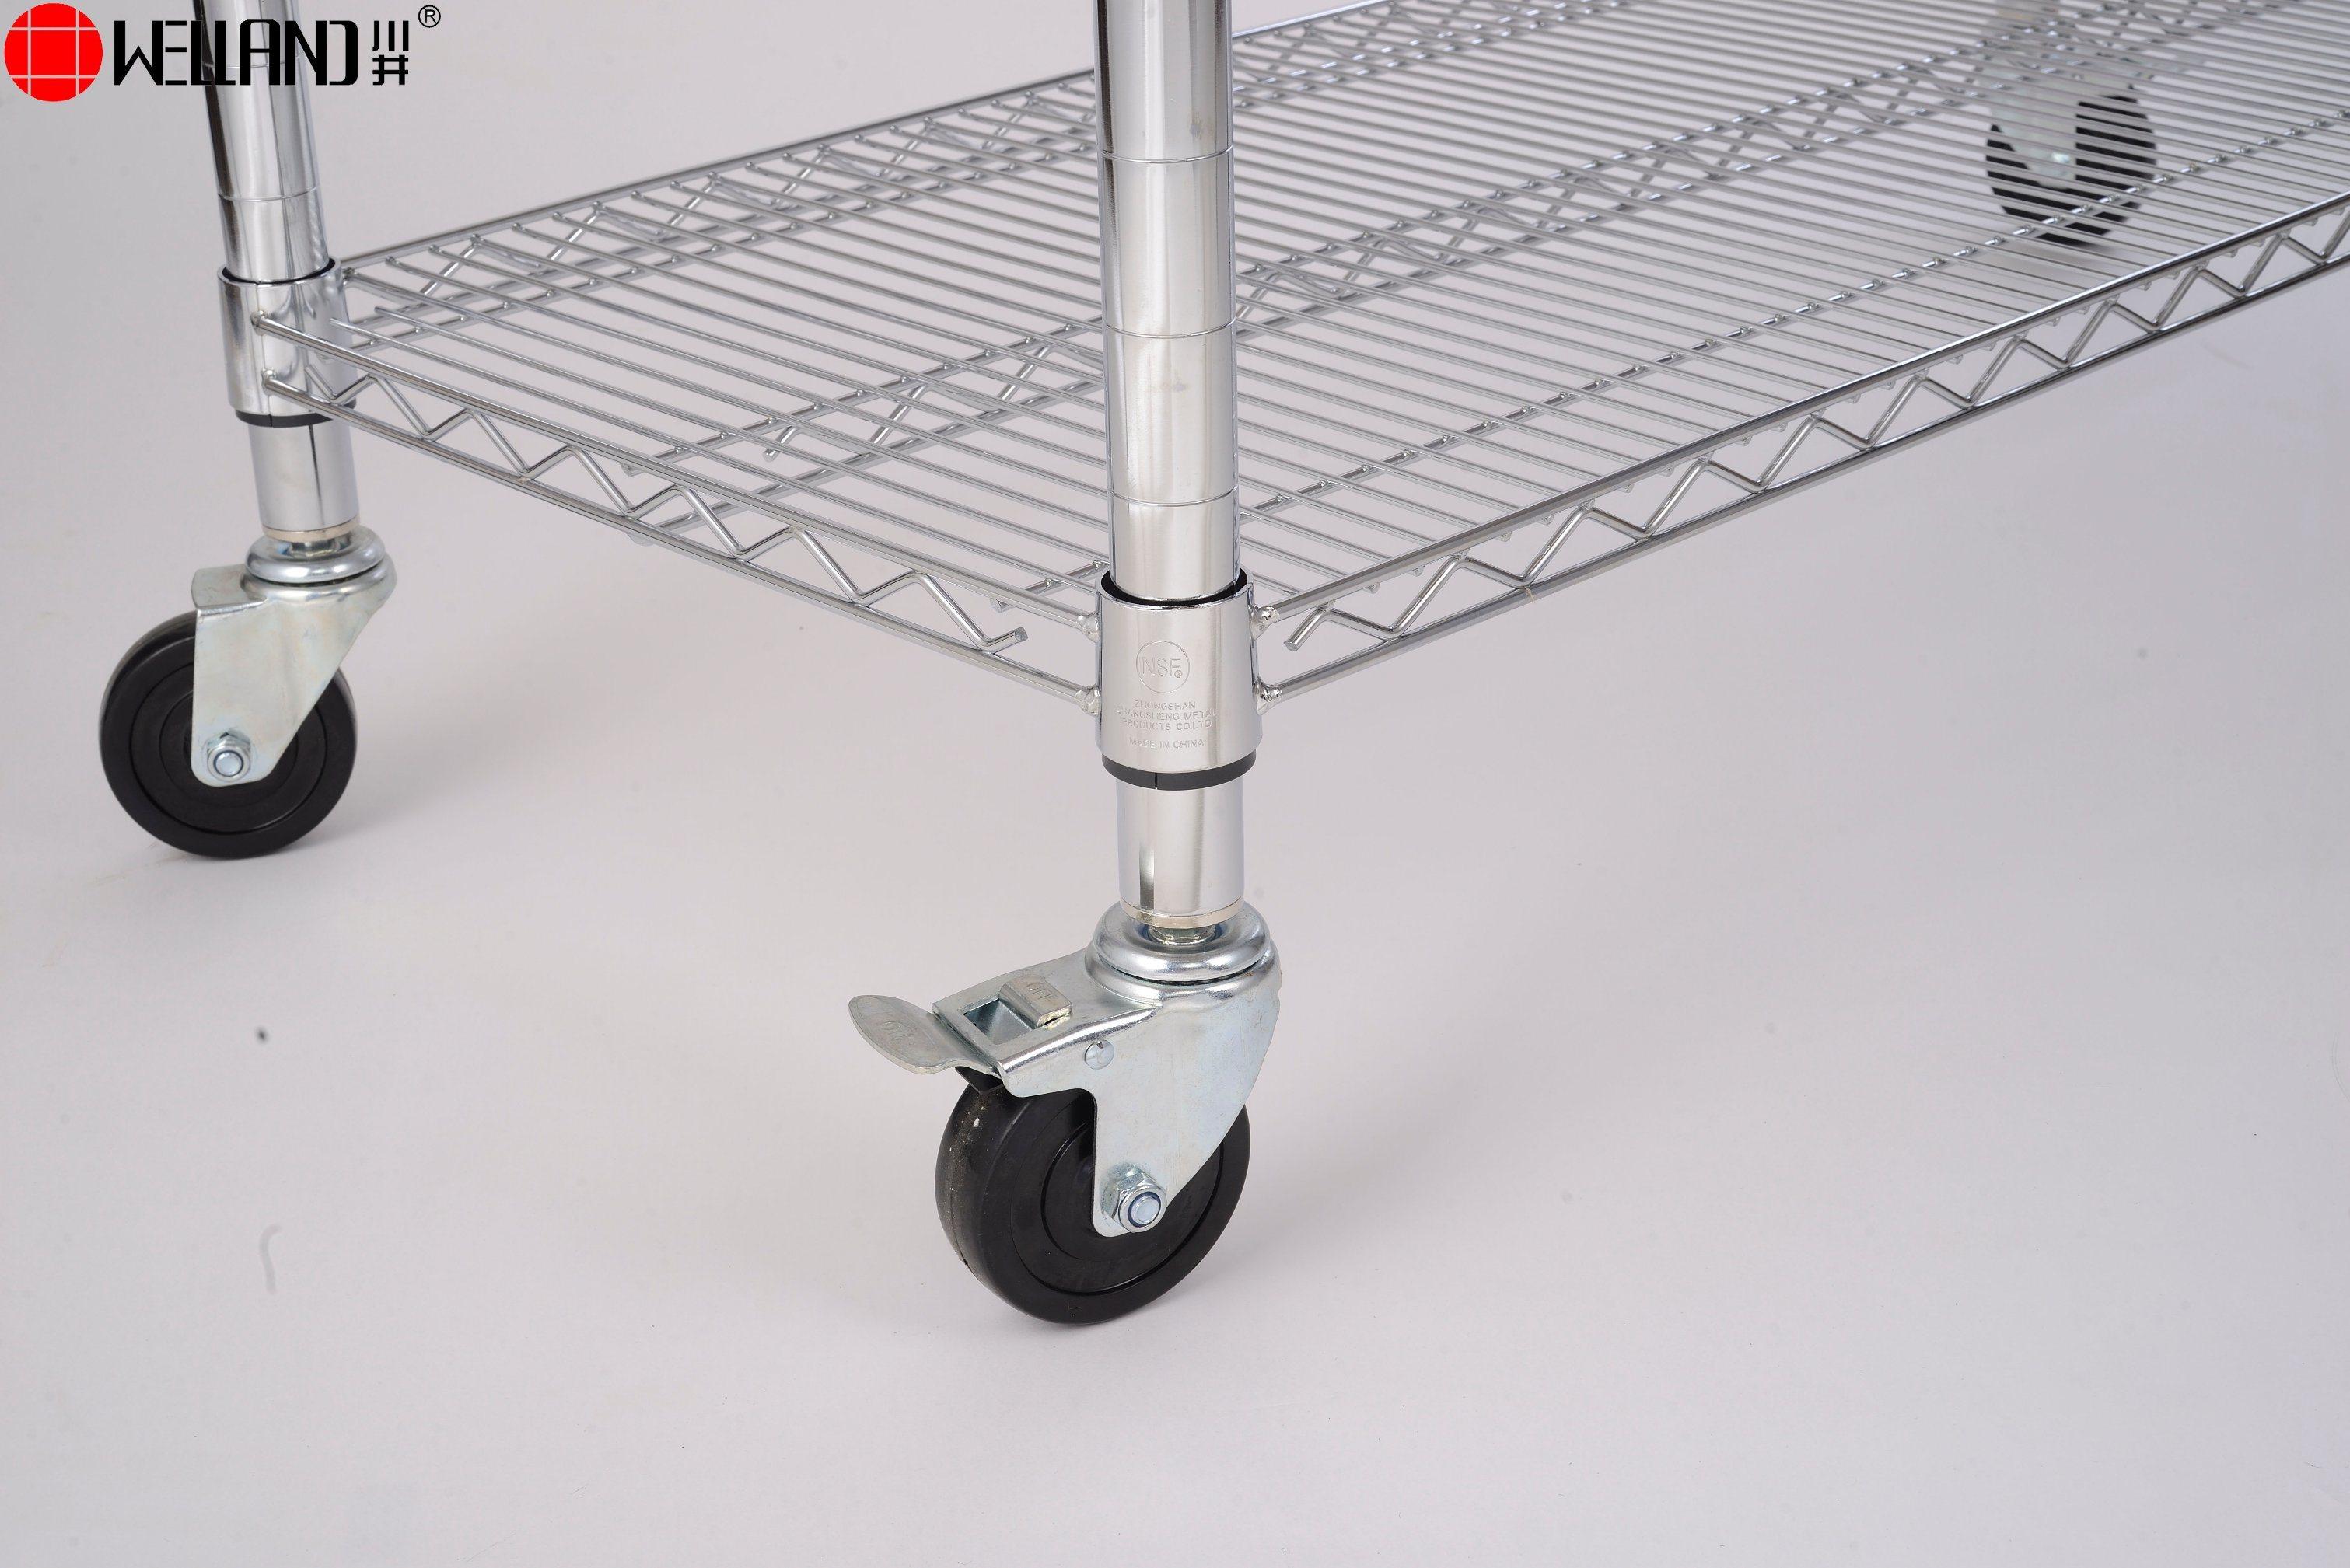 Fine Stainless Steel Wire Racks Mold - Wiring Diagram Ideas ...